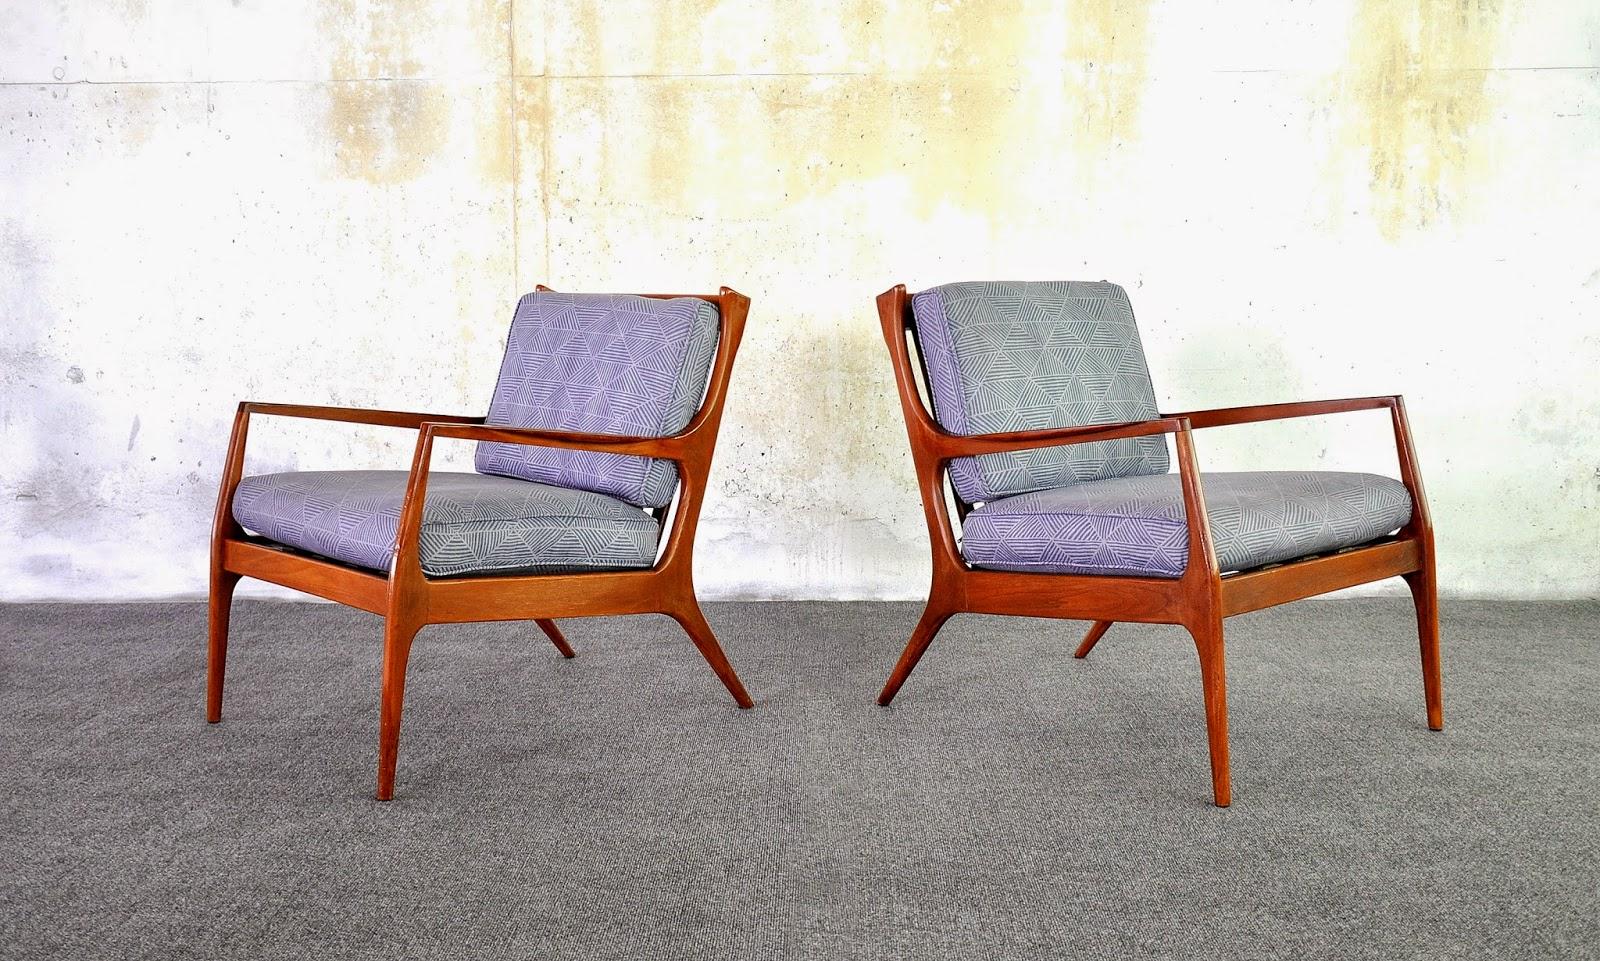 Selig Kofod-Larsen chairs refinish advice - Design Addict